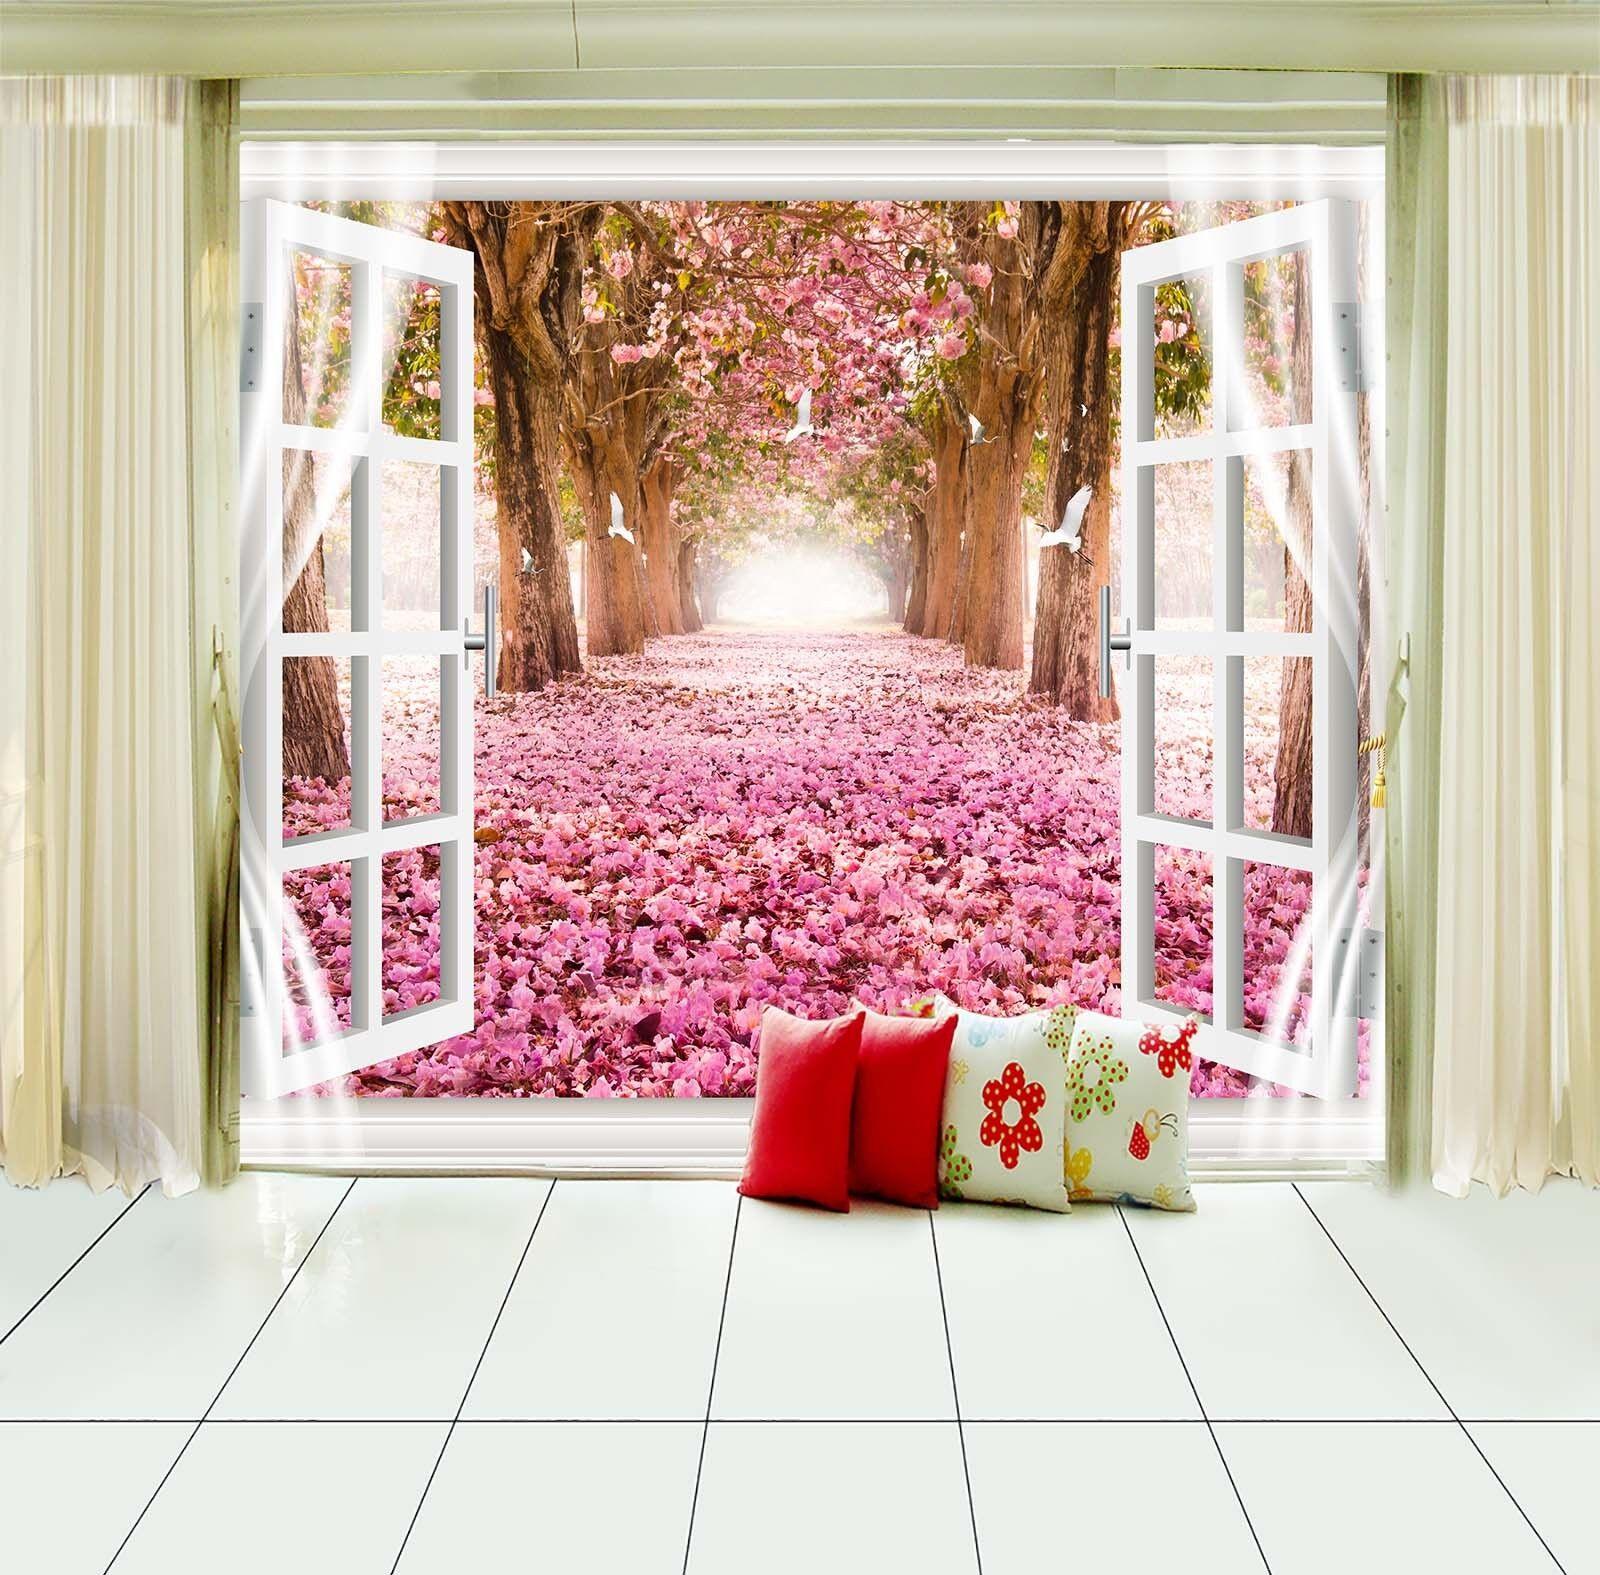 3D Aus dem Fenster Garten Fototapeten Wandbild Fototapete BildTapete Familie DE